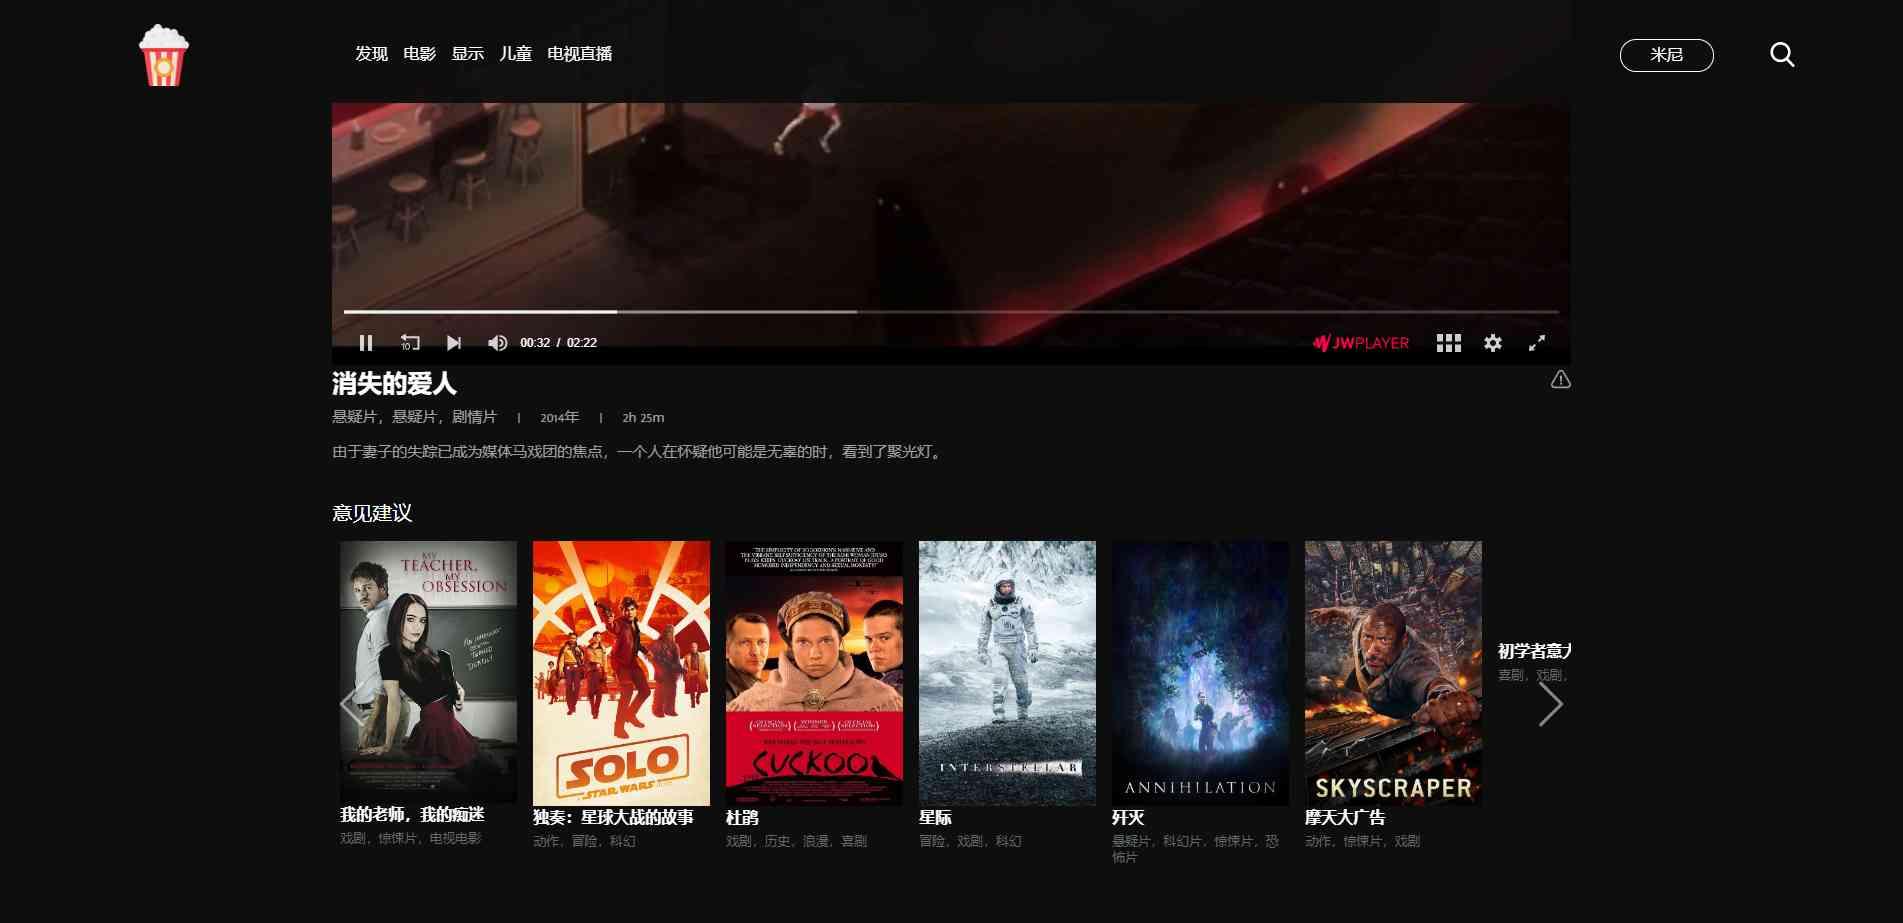 CinemaRex v1.4.9国外流媒体电影视频播放系统仿奈飞Netflix-常网小站Miknio